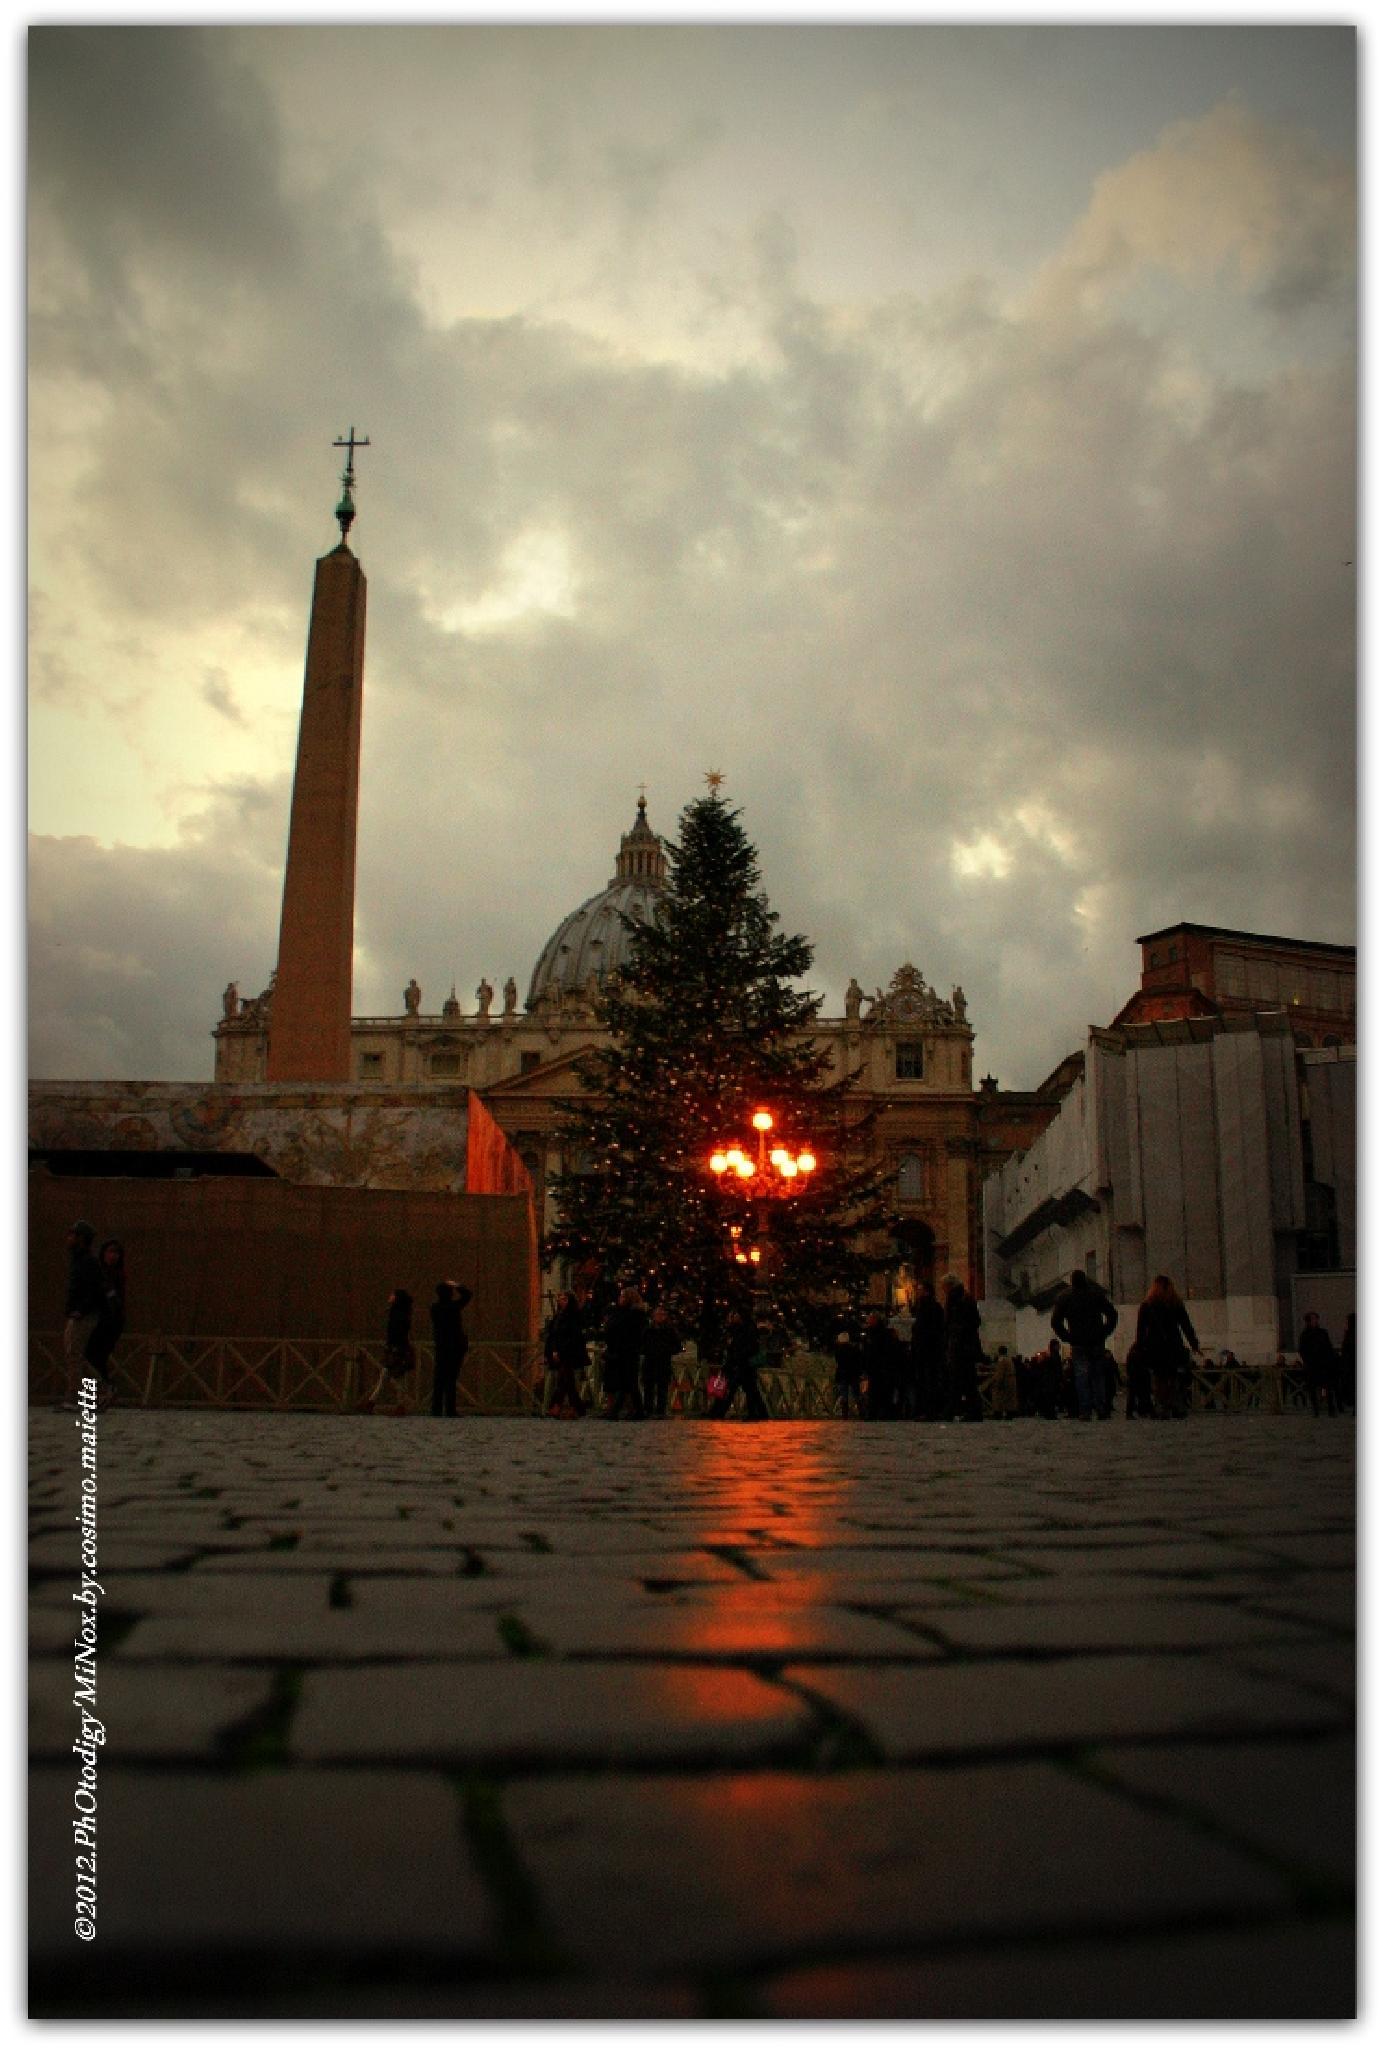 St. Peter's Square by Ph.Dg.Mi. cosimo maietta